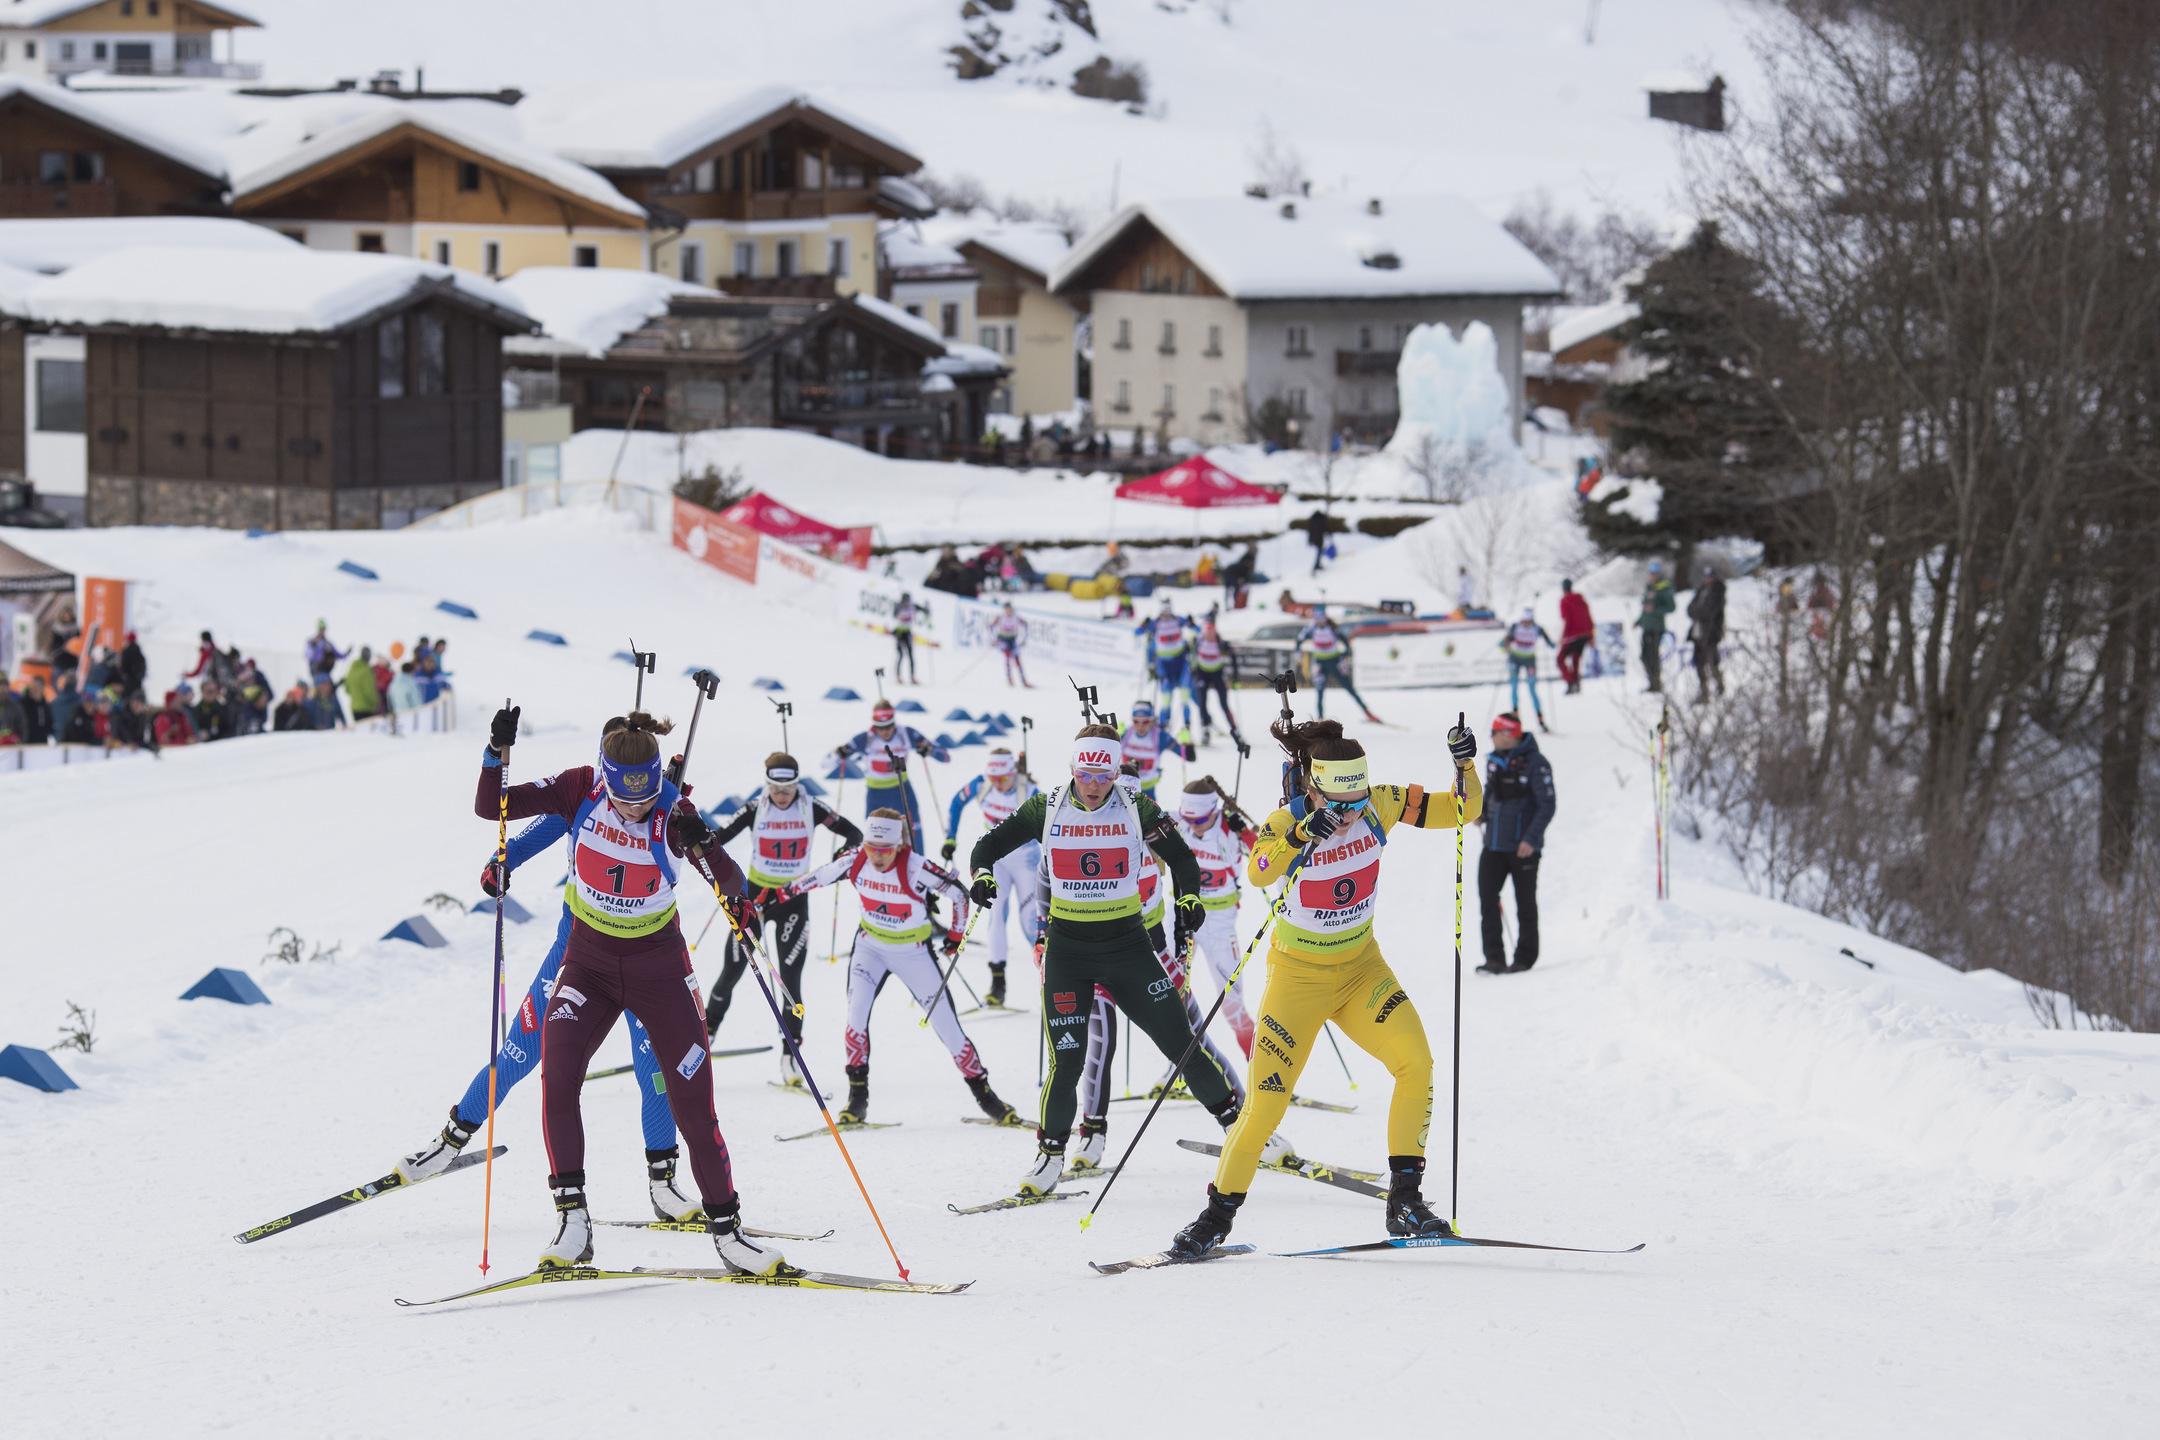 Calendrier Piste 2021 Biathlon   IBU Cup   Le calendrier 2021   Sports Infos   Ski